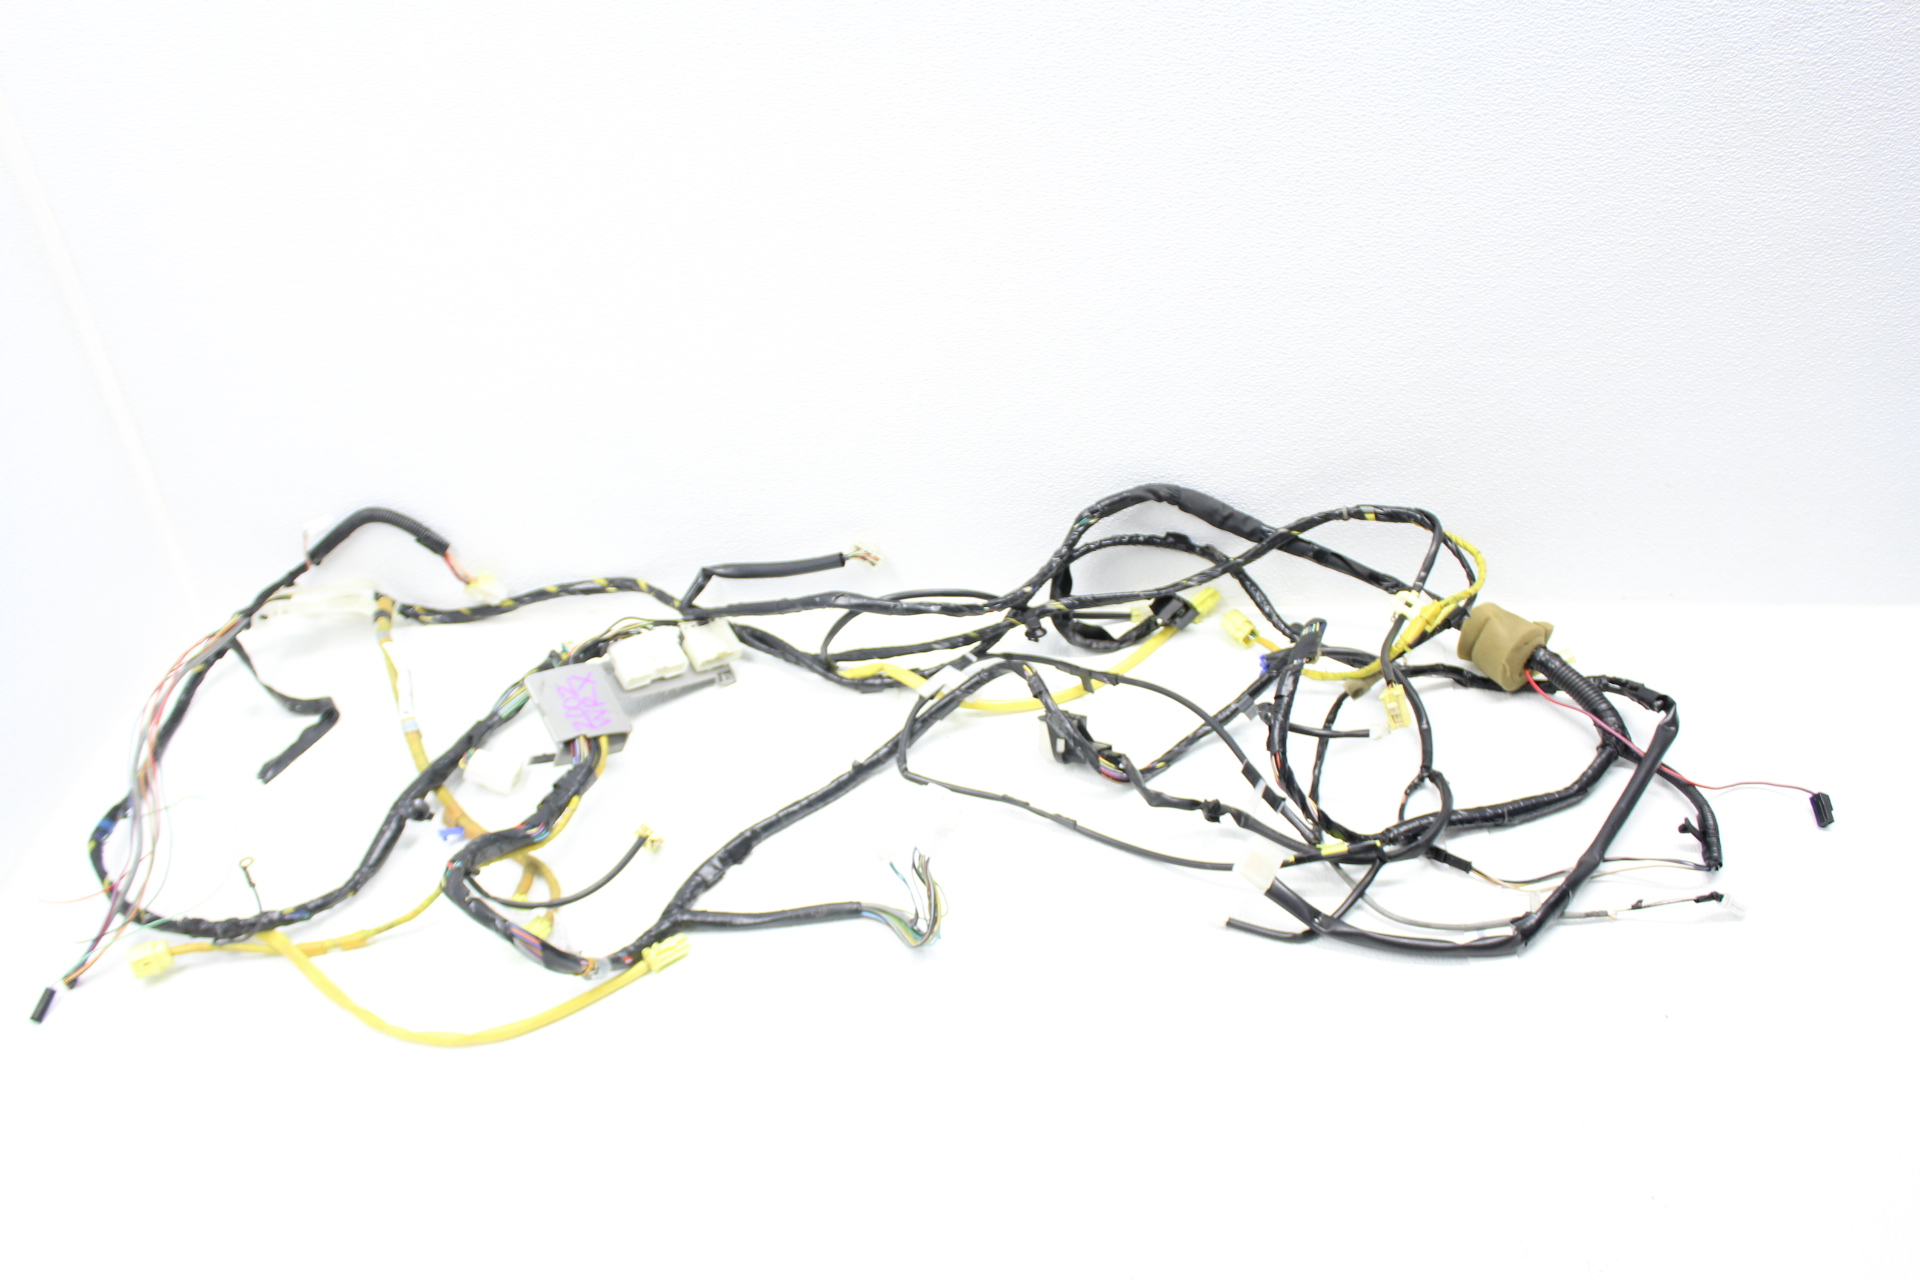 Subaru Impreza Wrx Interior Wire Wiring Harness